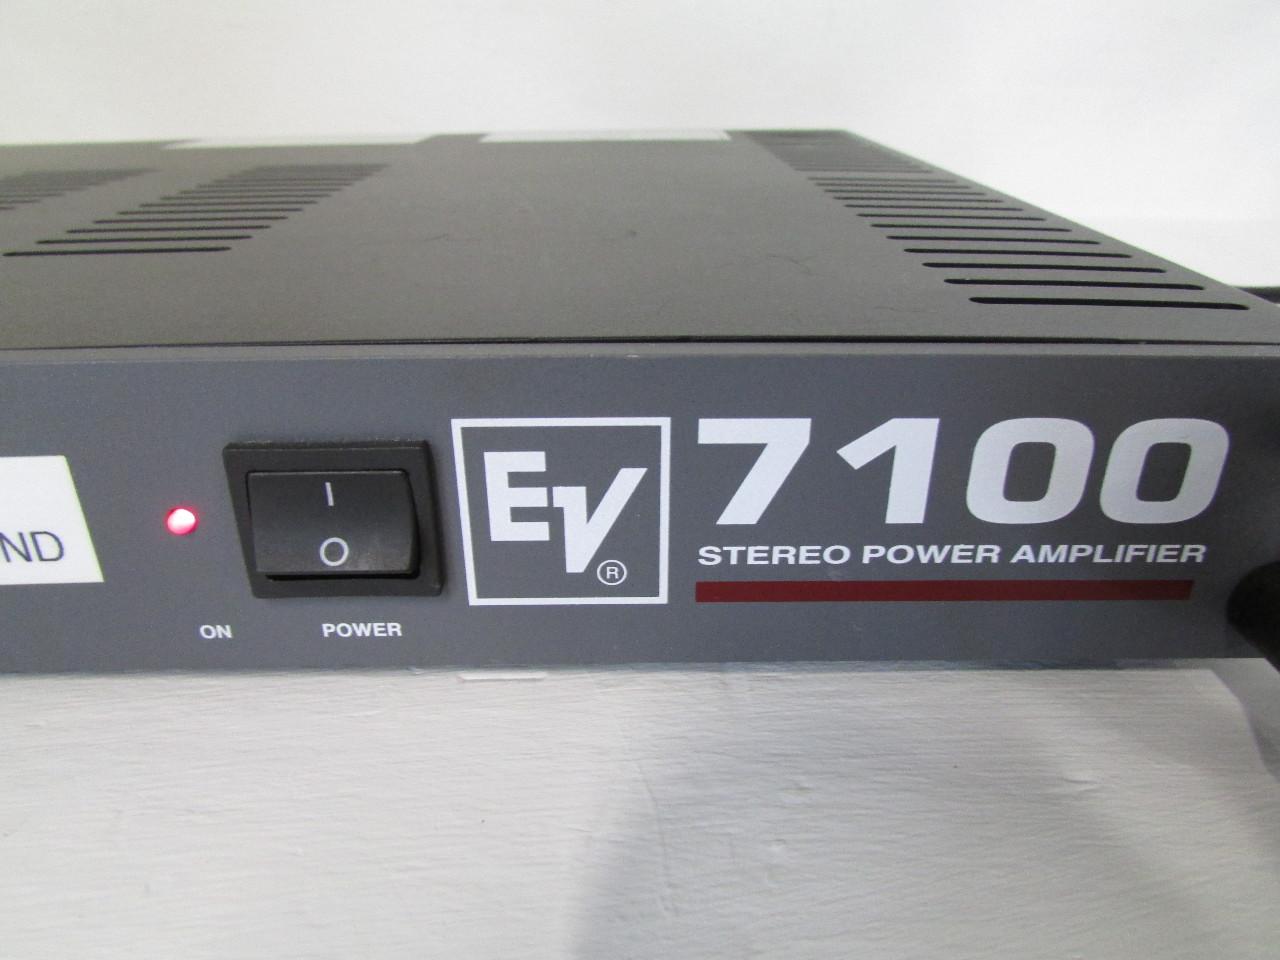 electro voice 7100 stereo power amplifier premier equipment solutions inc. Black Bedroom Furniture Sets. Home Design Ideas